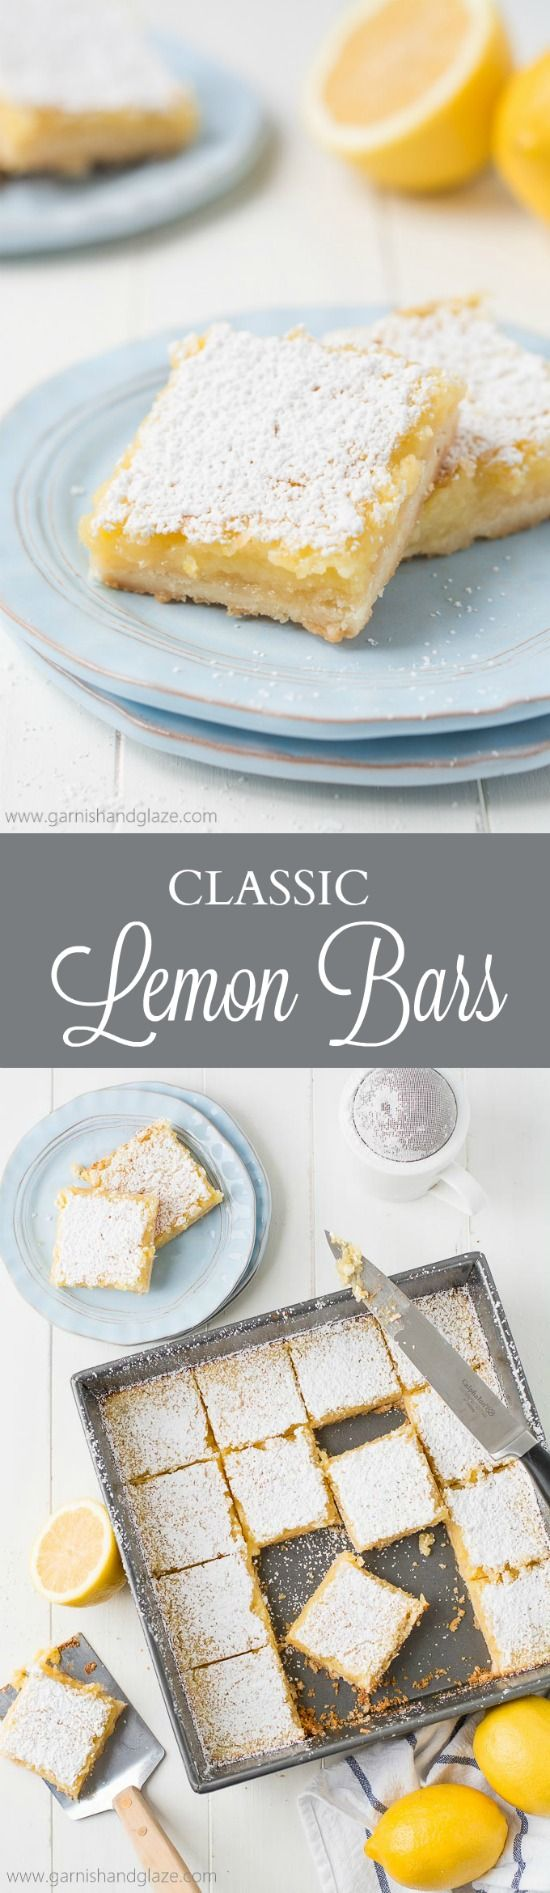 Classic Lemon Bars | Recipe | Sweet, Lemon bars and Tarts